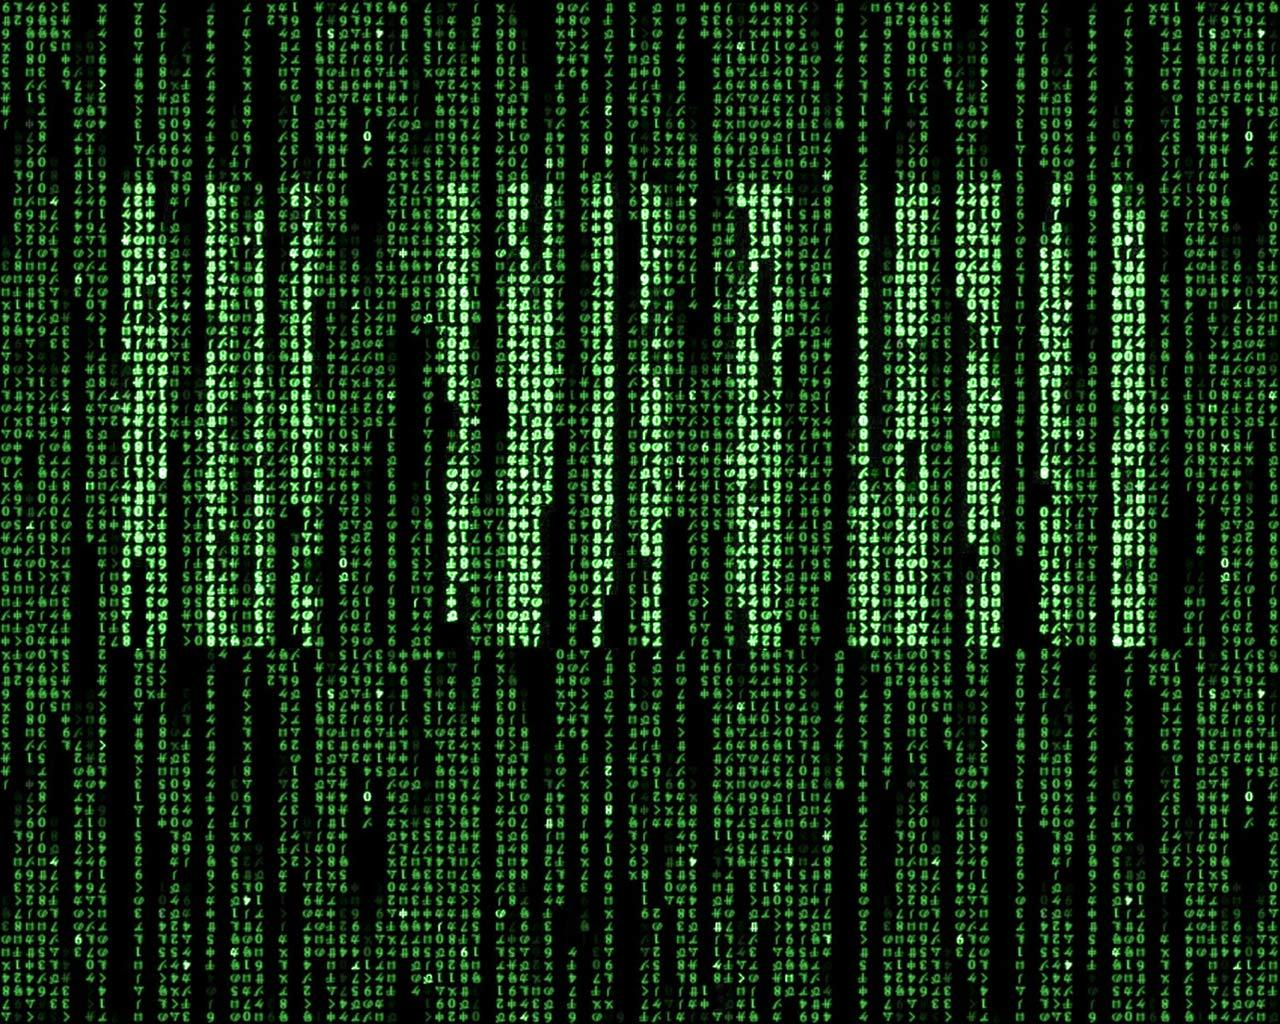 Matrix Desktop Background Moving Mac Wallpapers Records 1280x1024